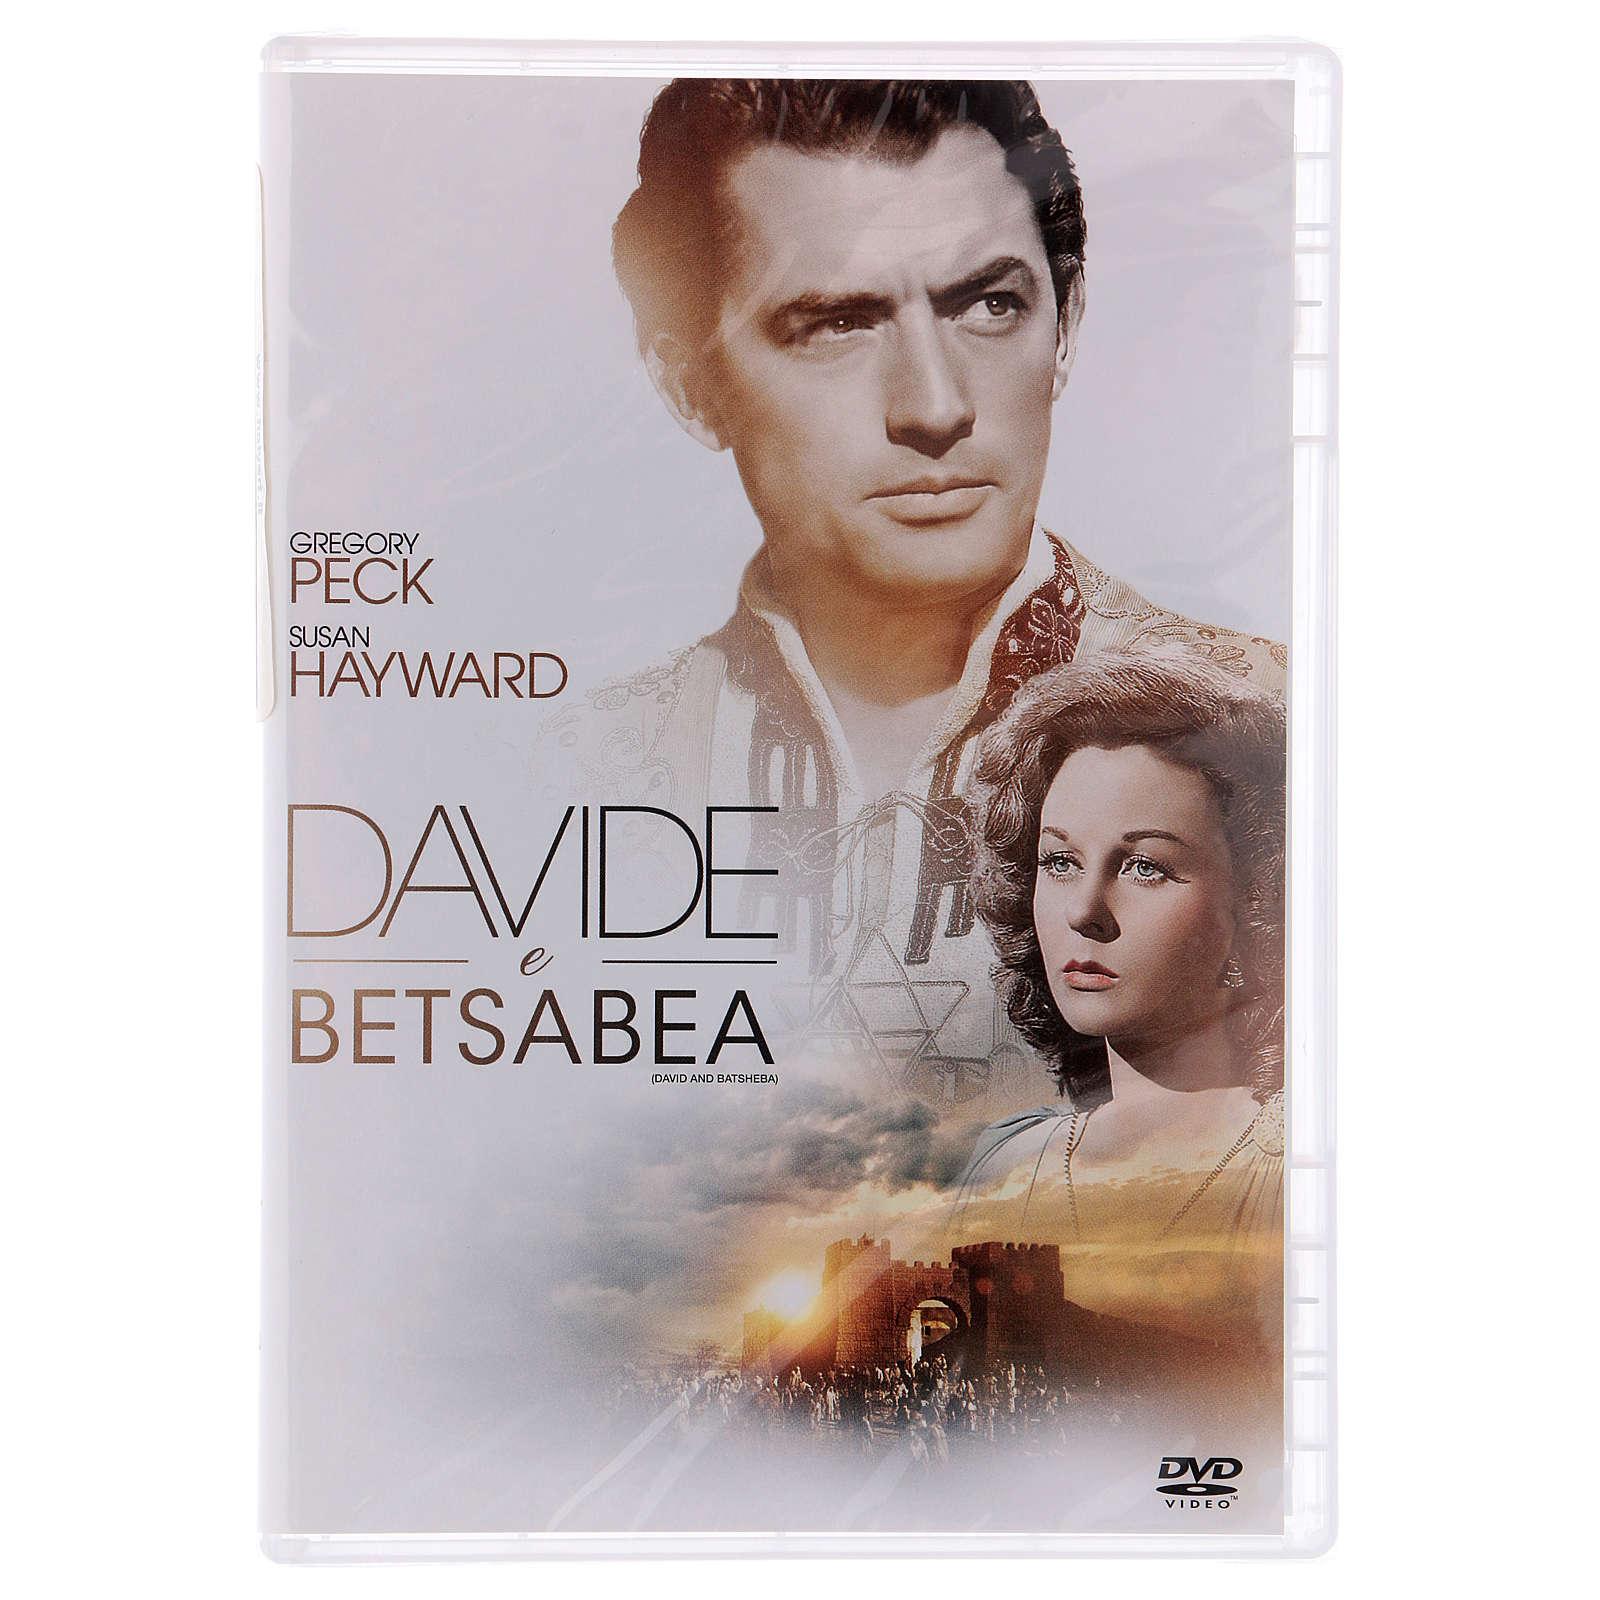 David and Bathsheba DVD 3